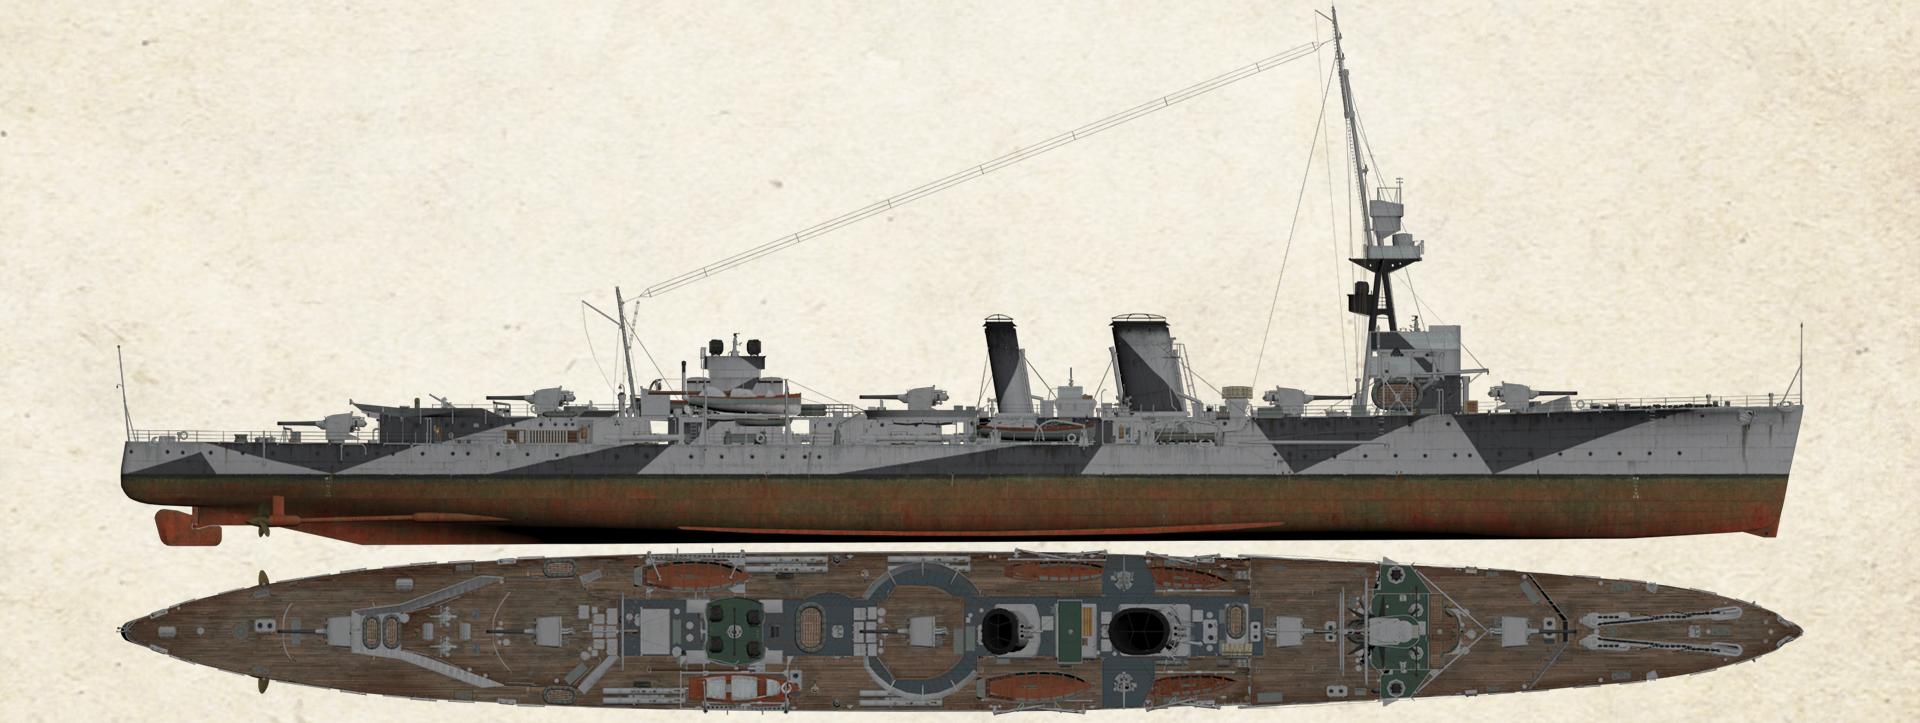 HMS Caledon ww2